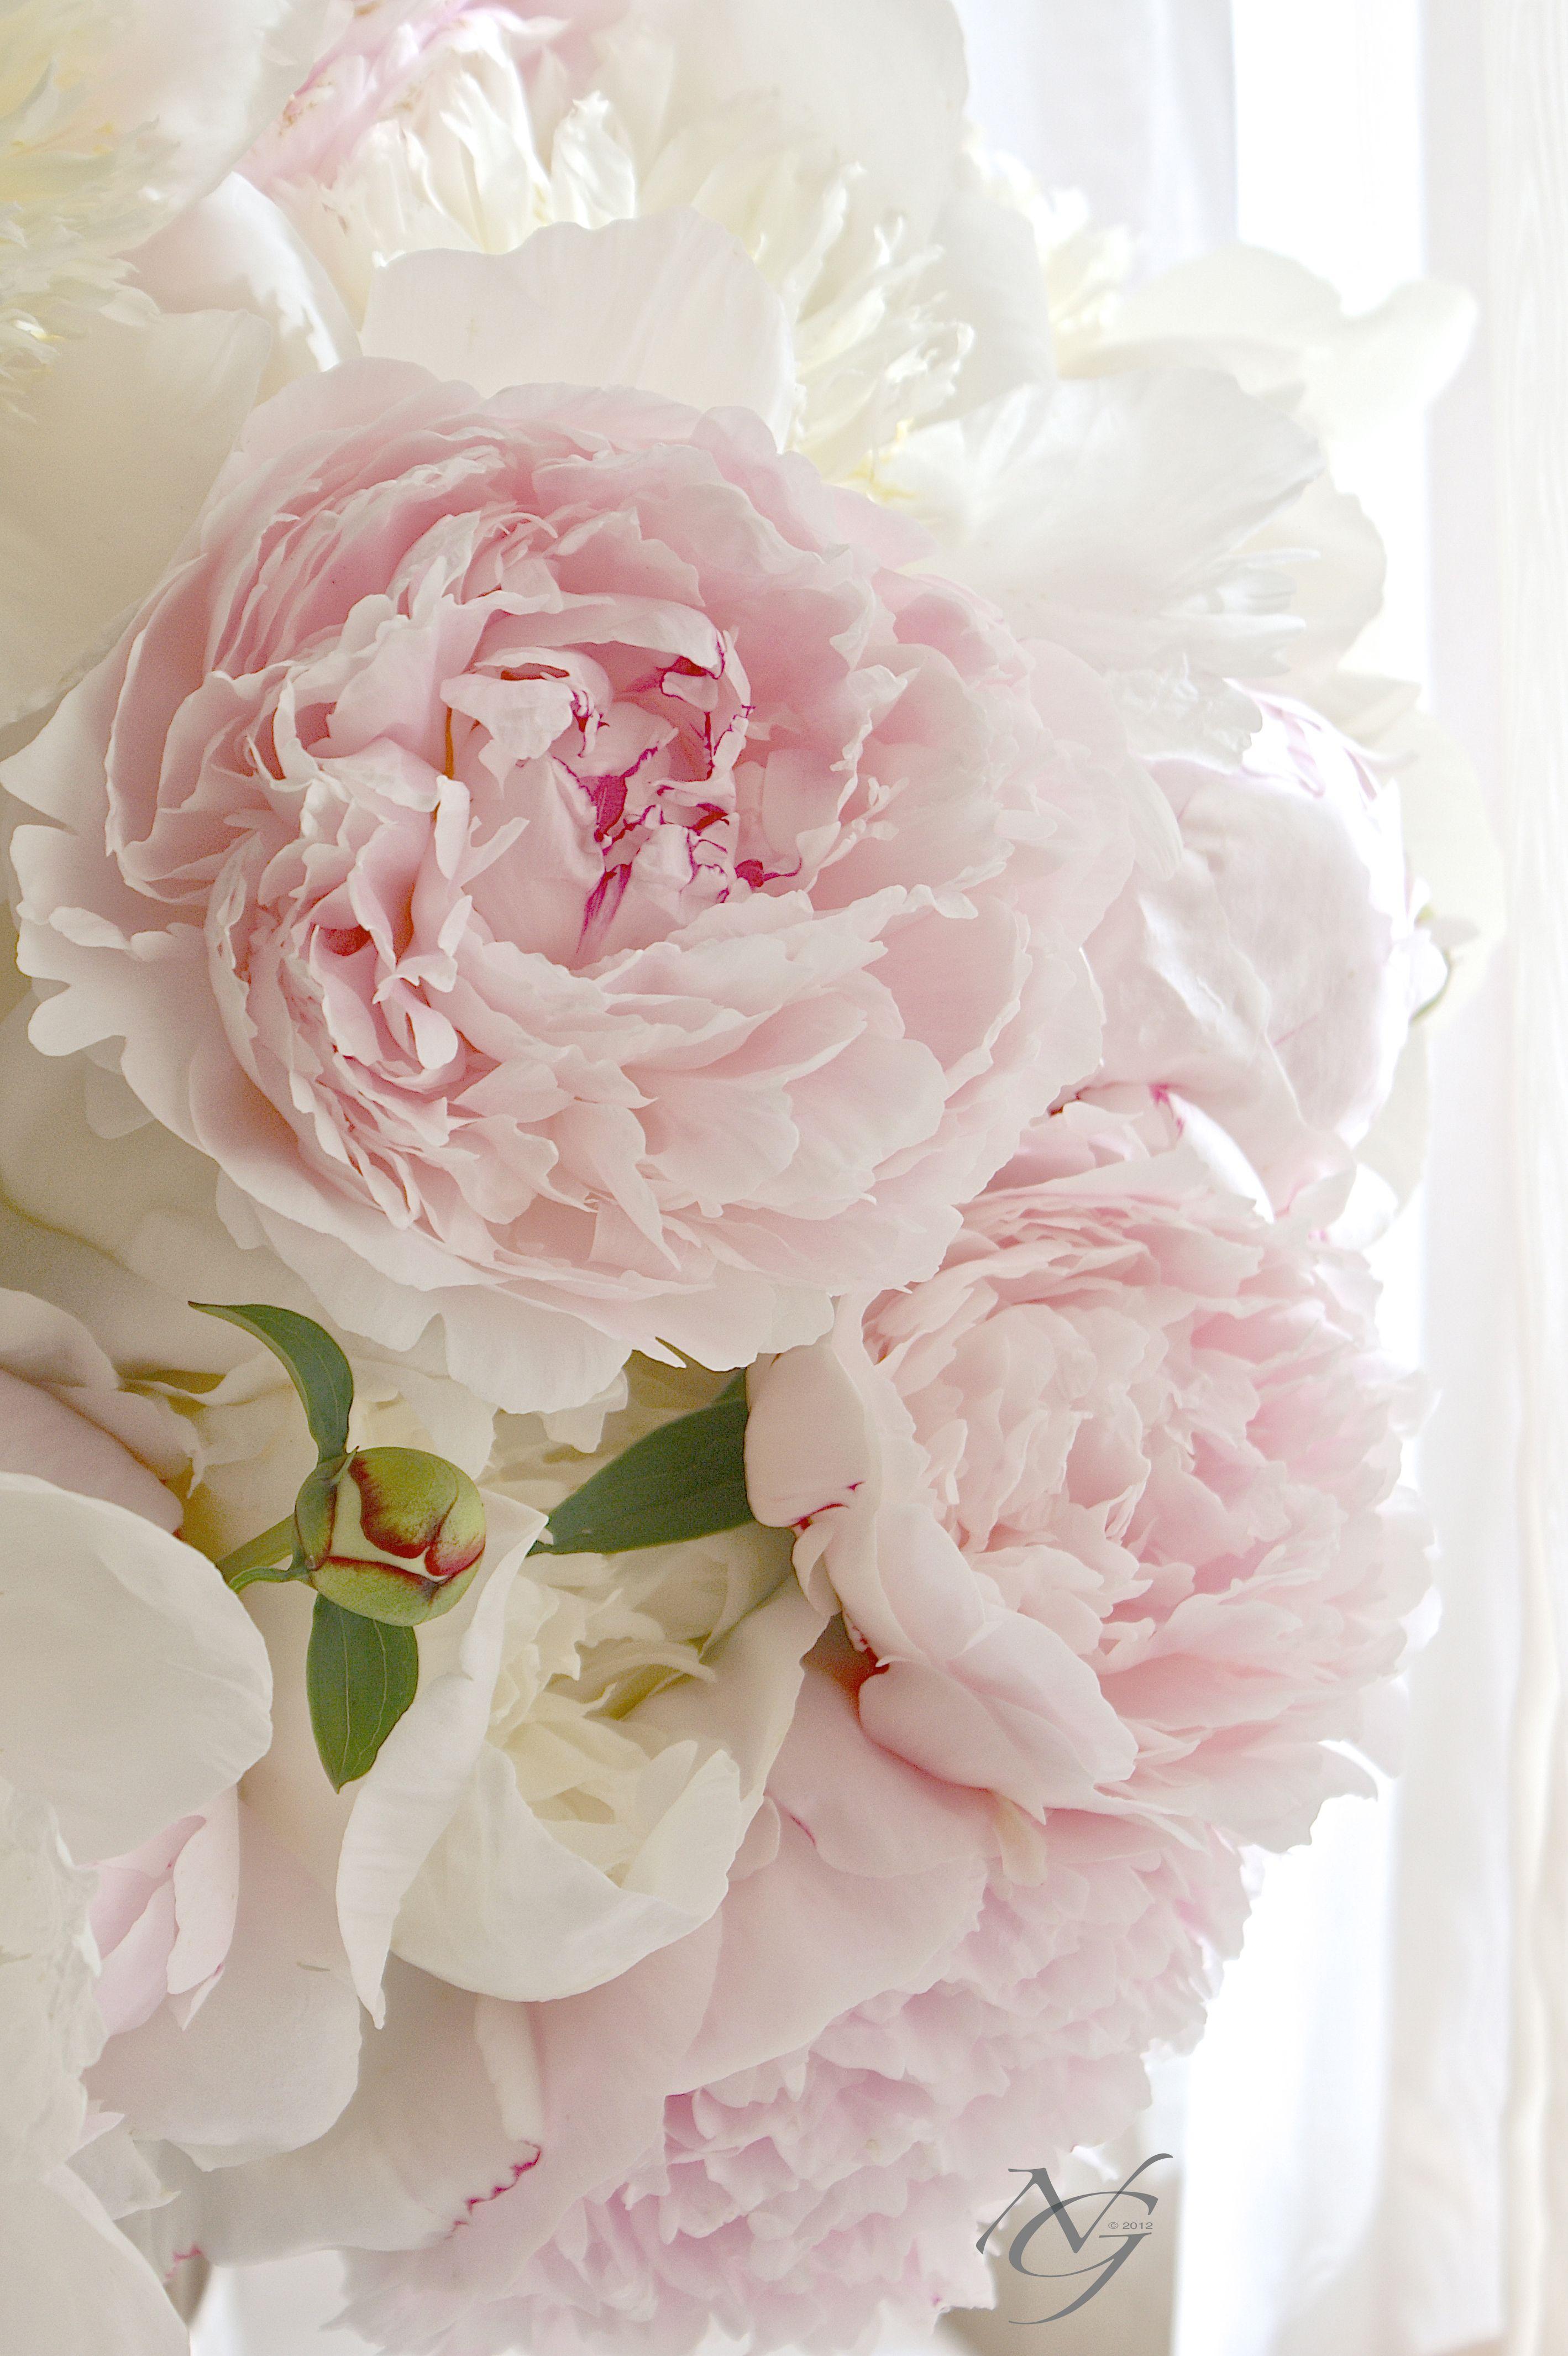 Peonies My Favorite Flower Rosa Pfingstrosen Schone Blumen Pfingstrosen